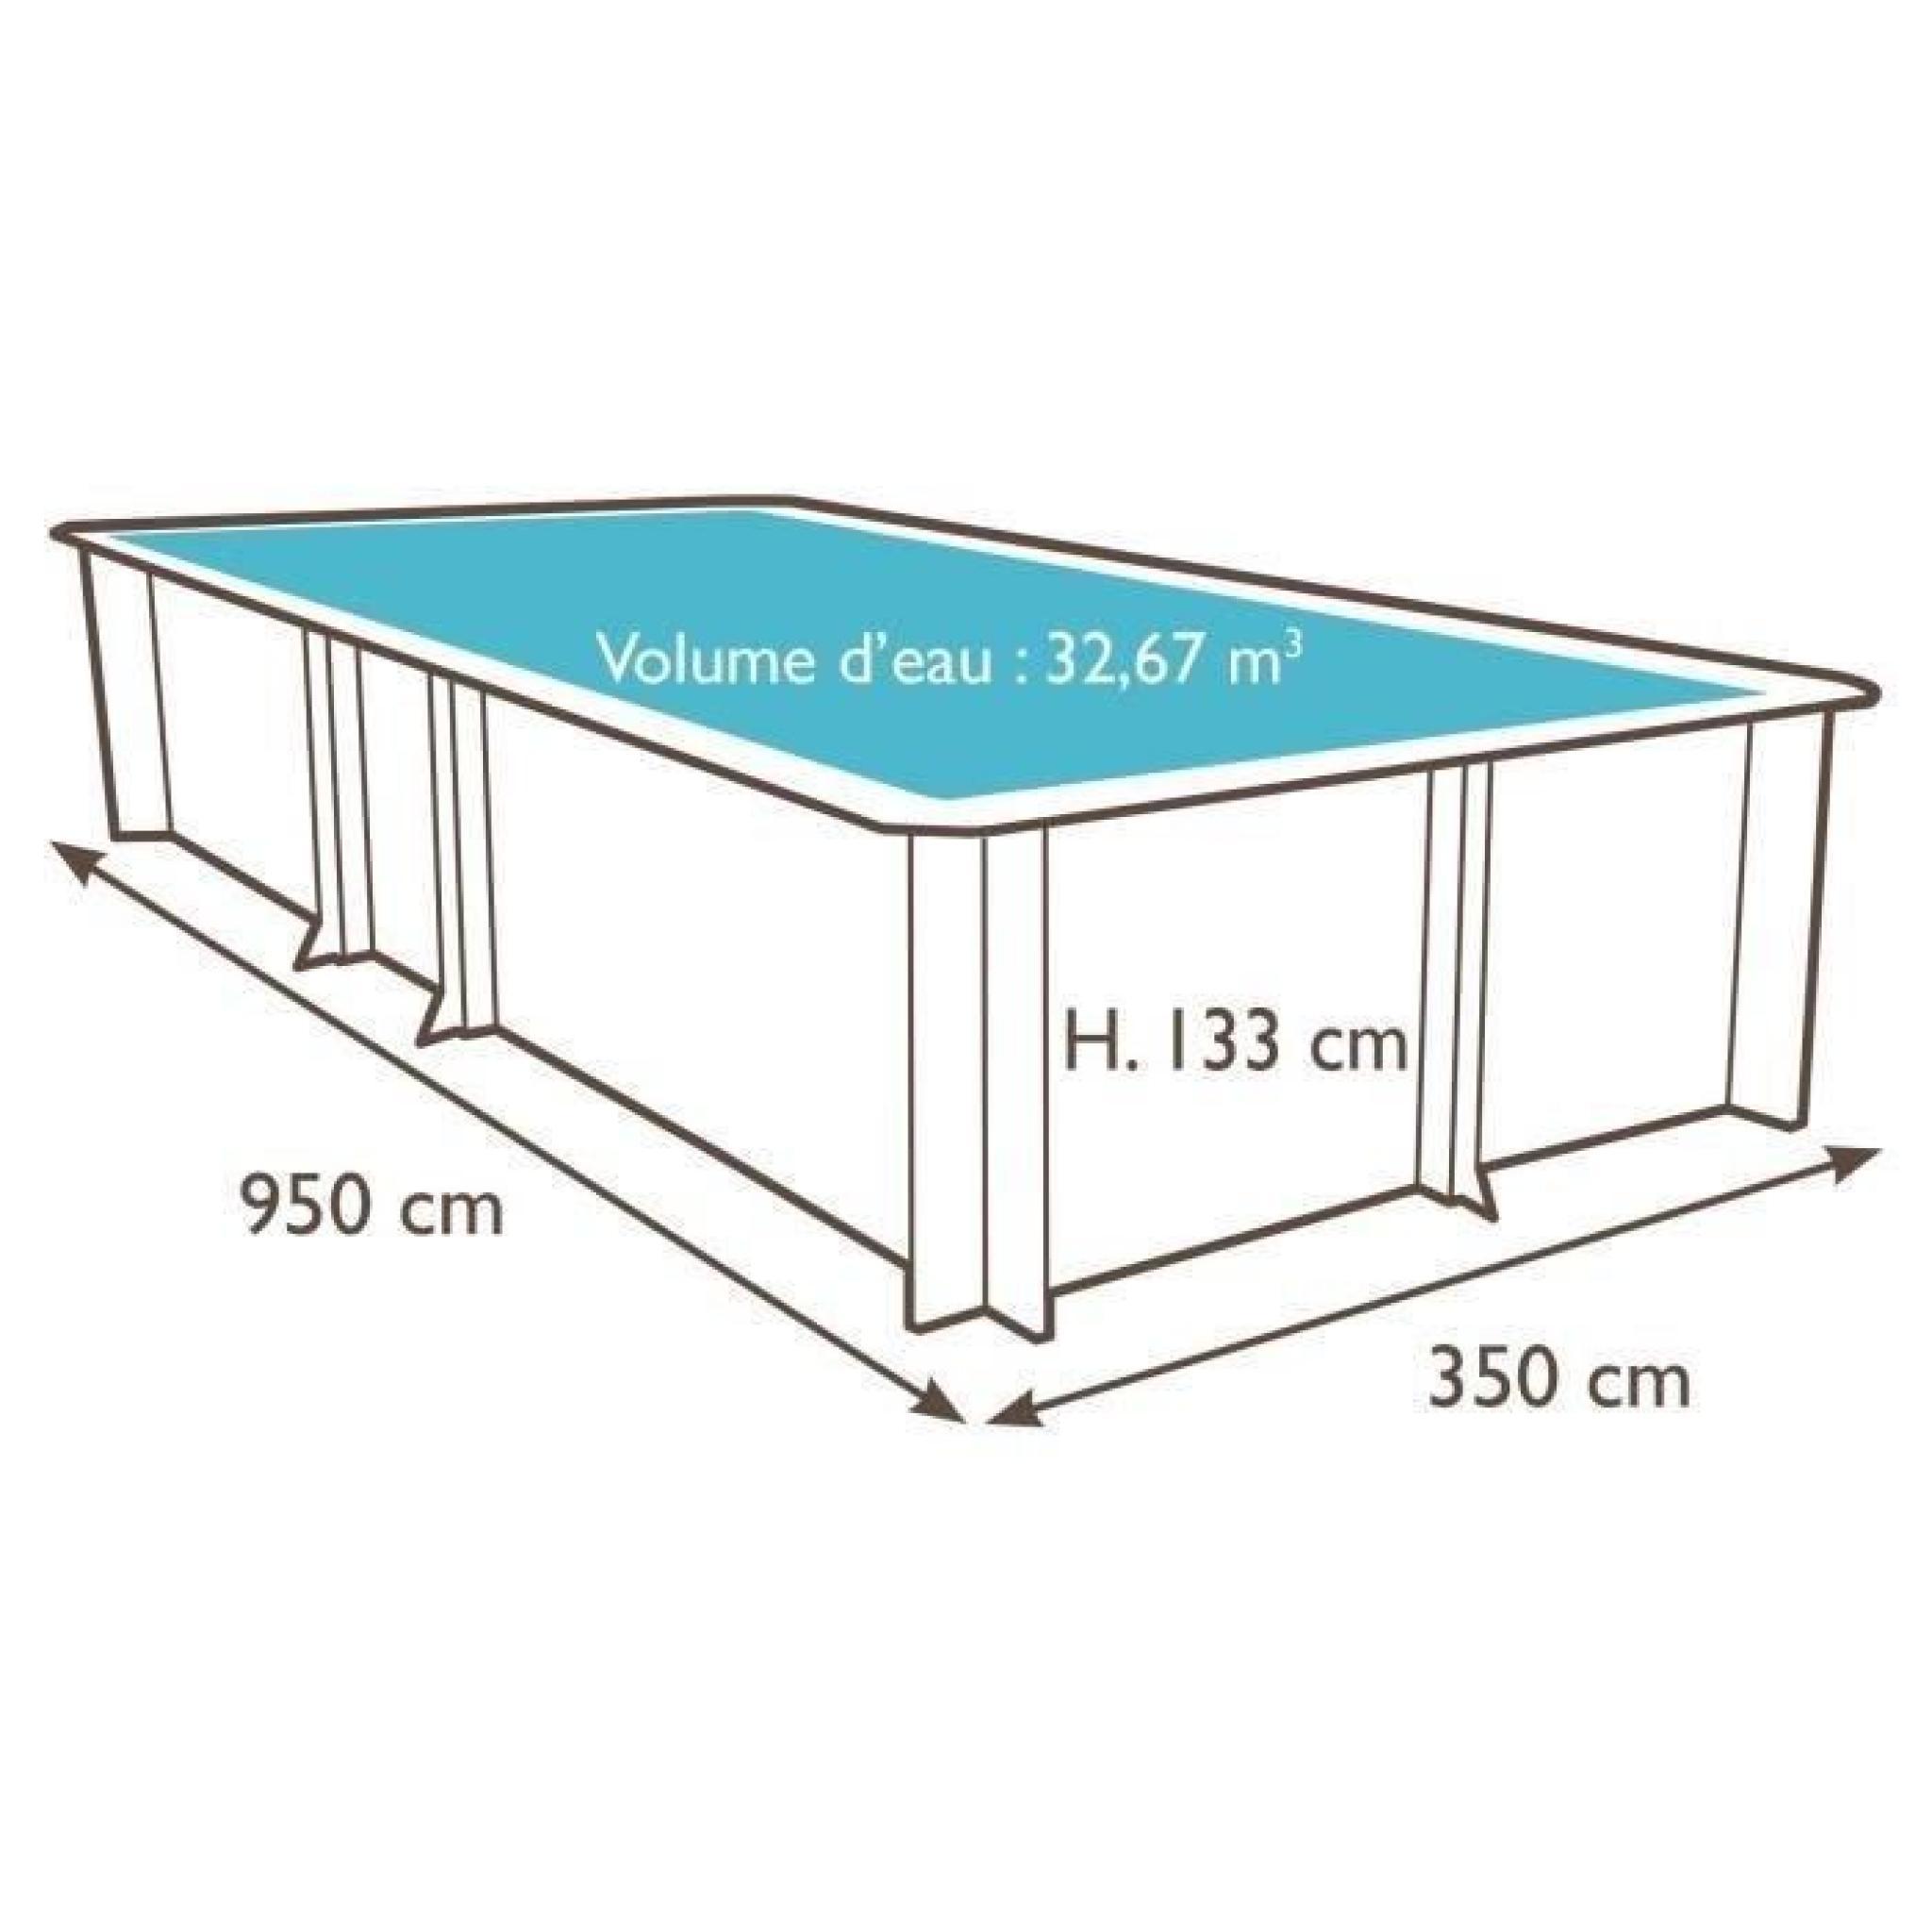 vente piscine bois cool tropic piscine bois m hauteur m achat vente piscine et bache piscine. Black Bedroom Furniture Sets. Home Design Ideas